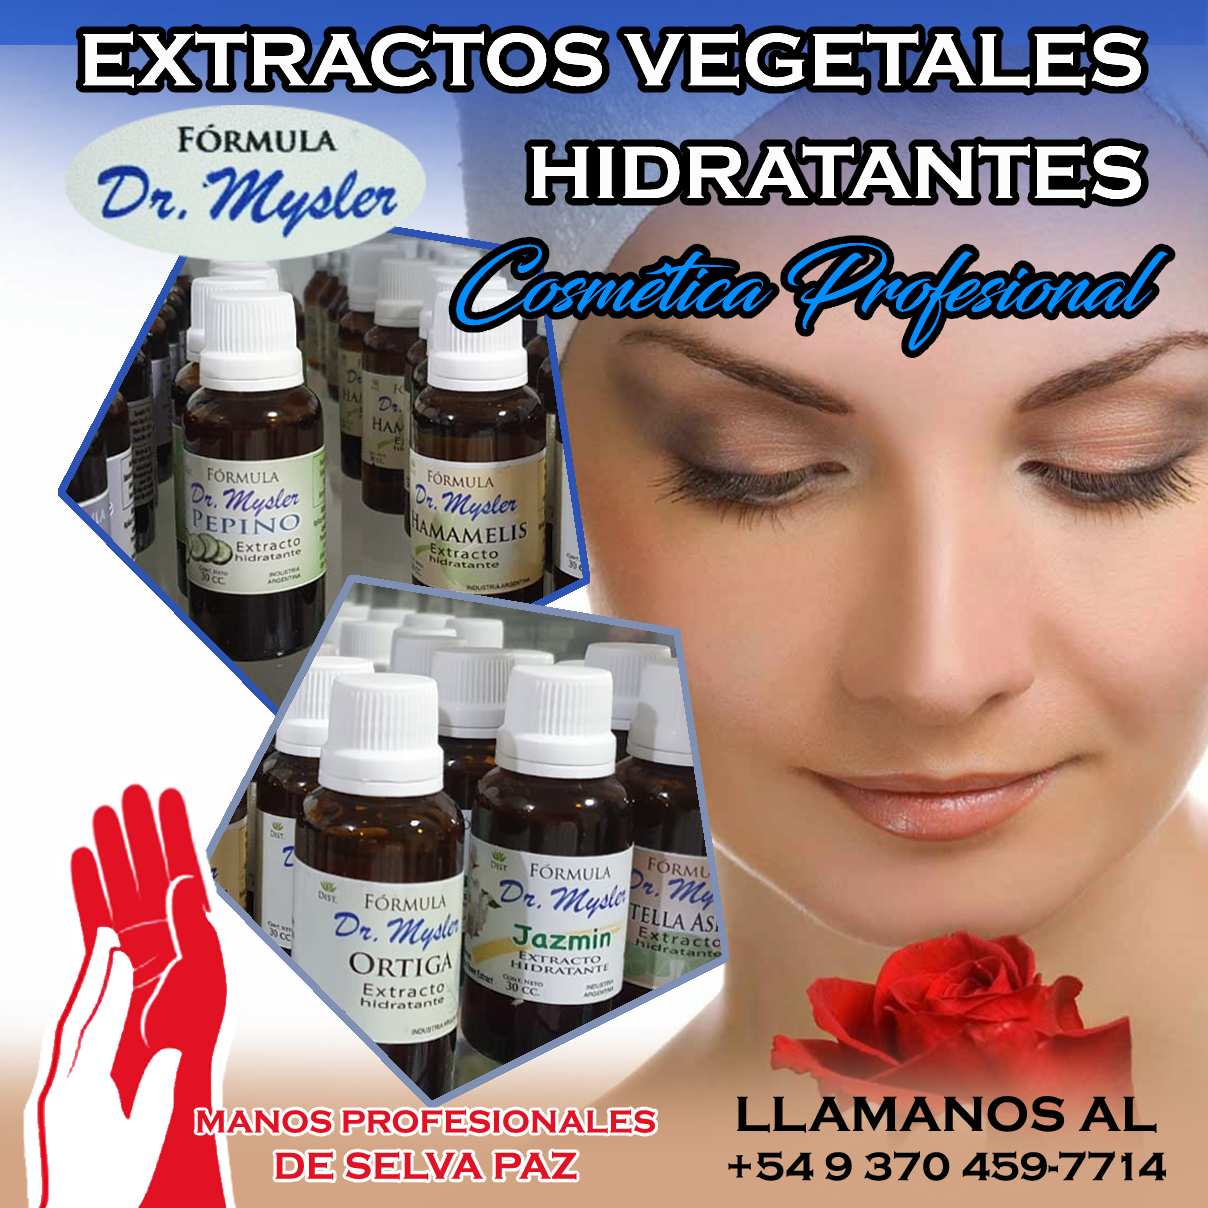 EXTRACTOS VEGETALES HIDRATANTES Fórmula Dr. Mysler